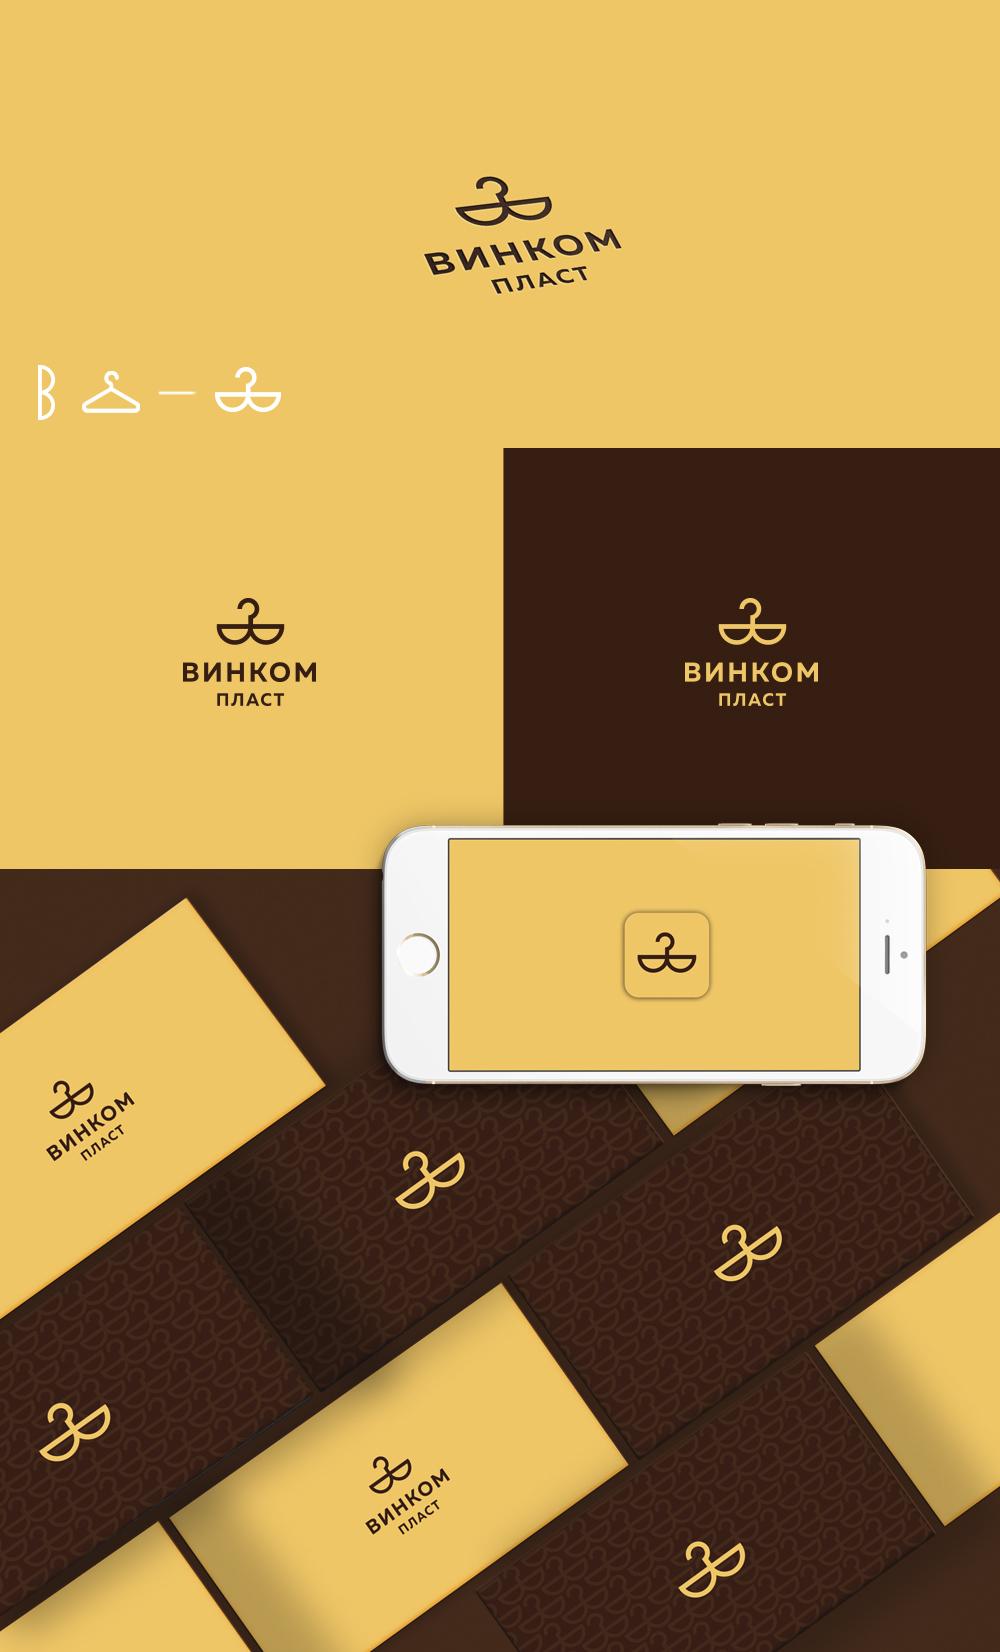 Логотип, фавикон и визитка для компании Винком Пласт  фото f_6395c386aa0d1a82.jpg